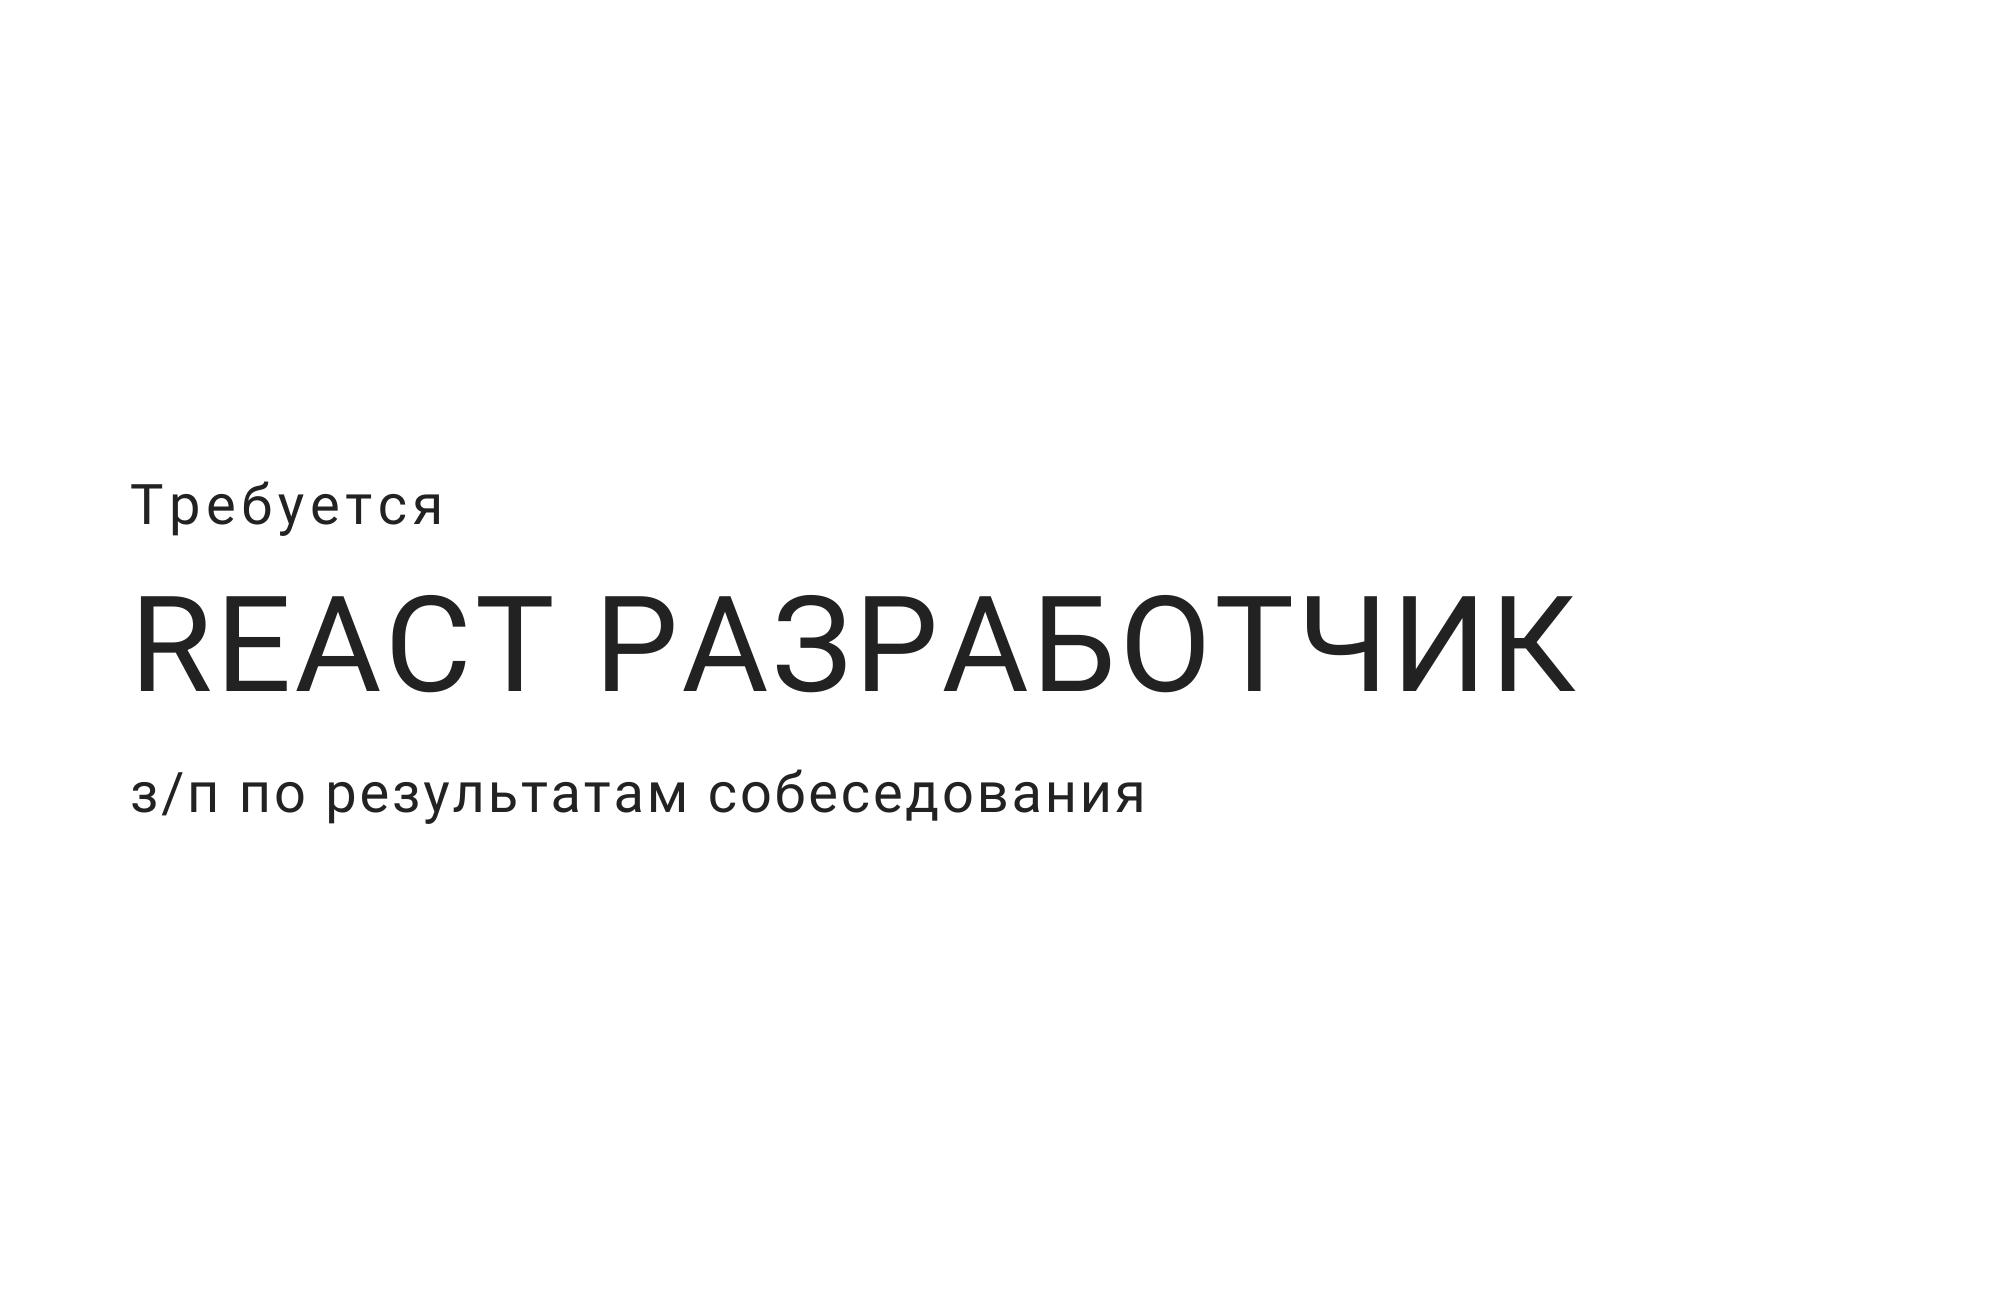 React разработчик